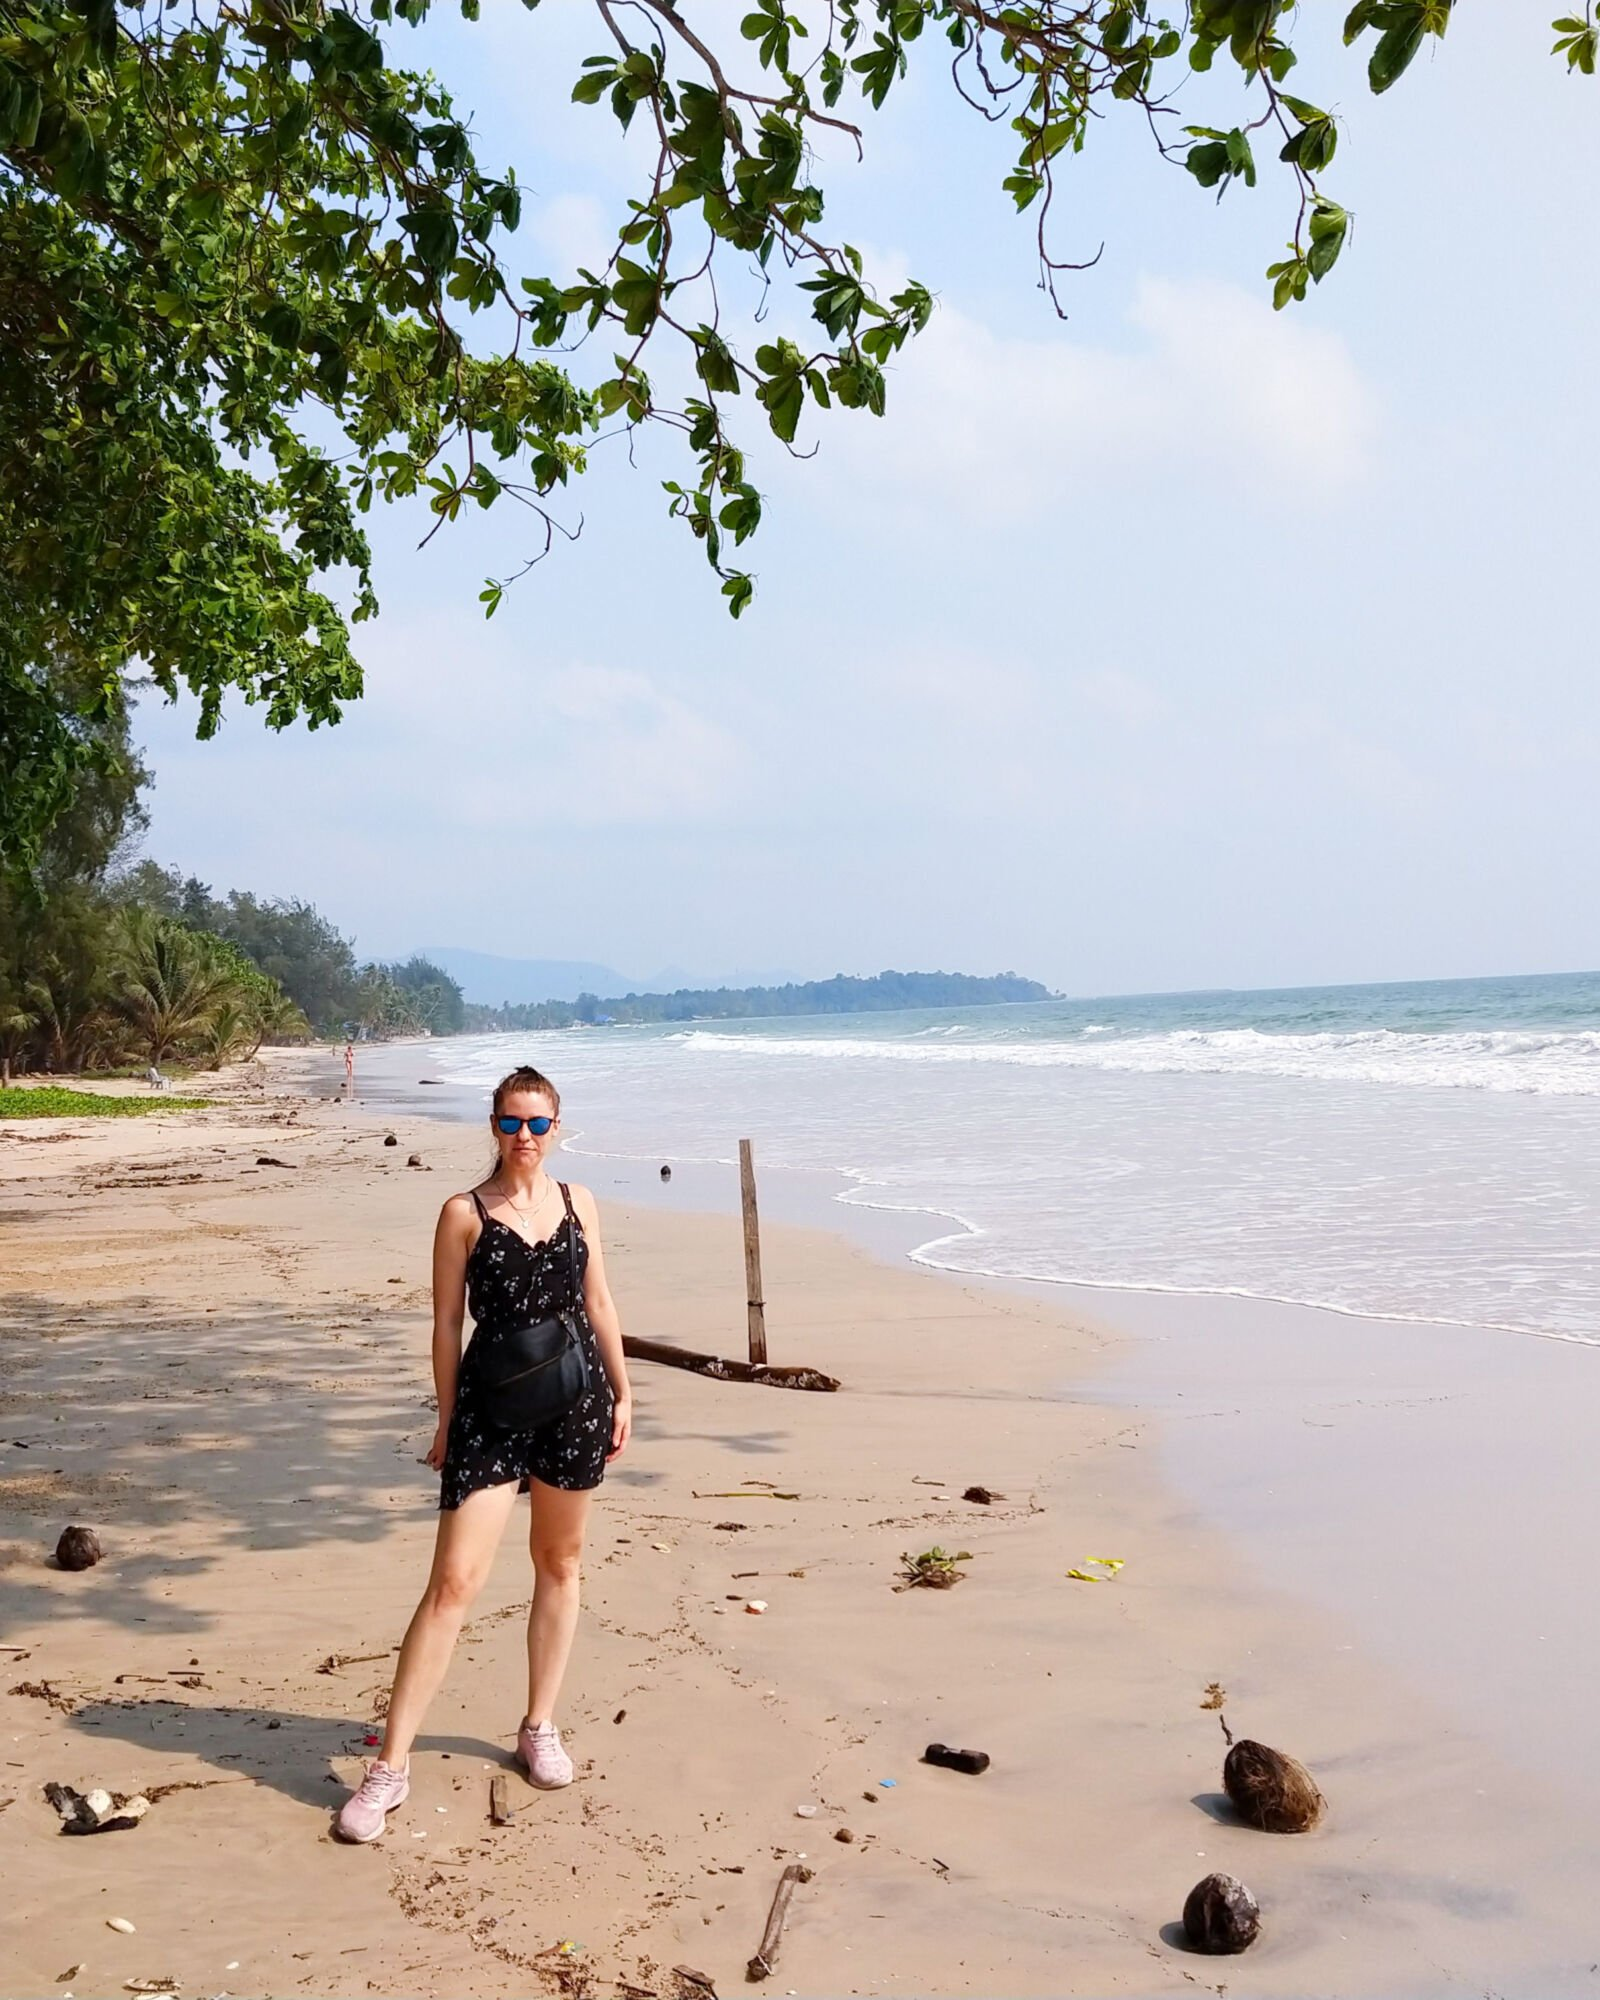 ja na plaży